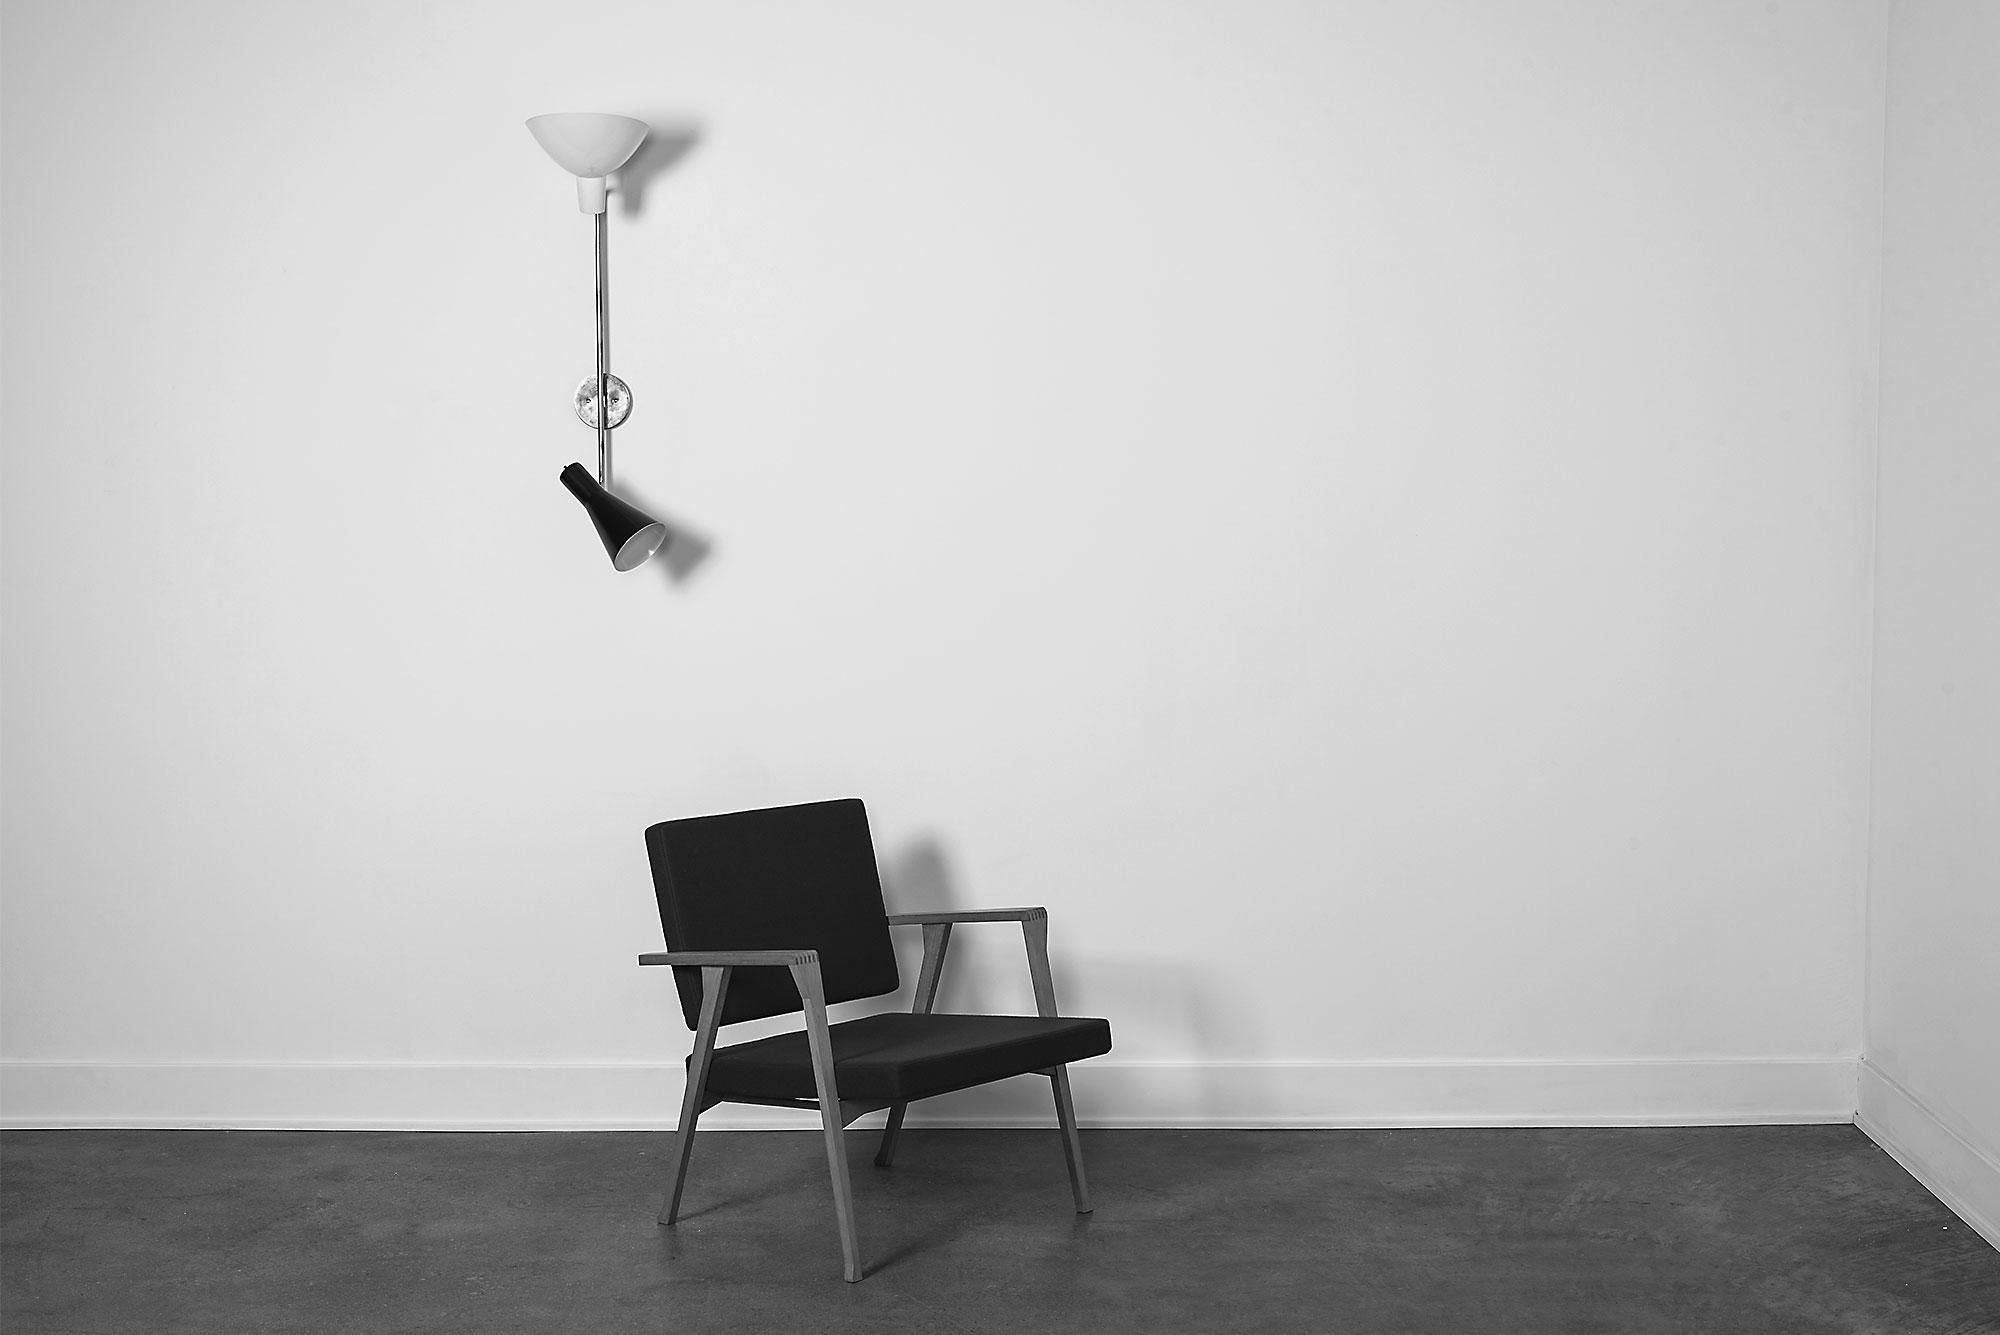 Gino Sarfatti and Vittoriano Viganò  |                              Wall light, model 199 (black and white version)